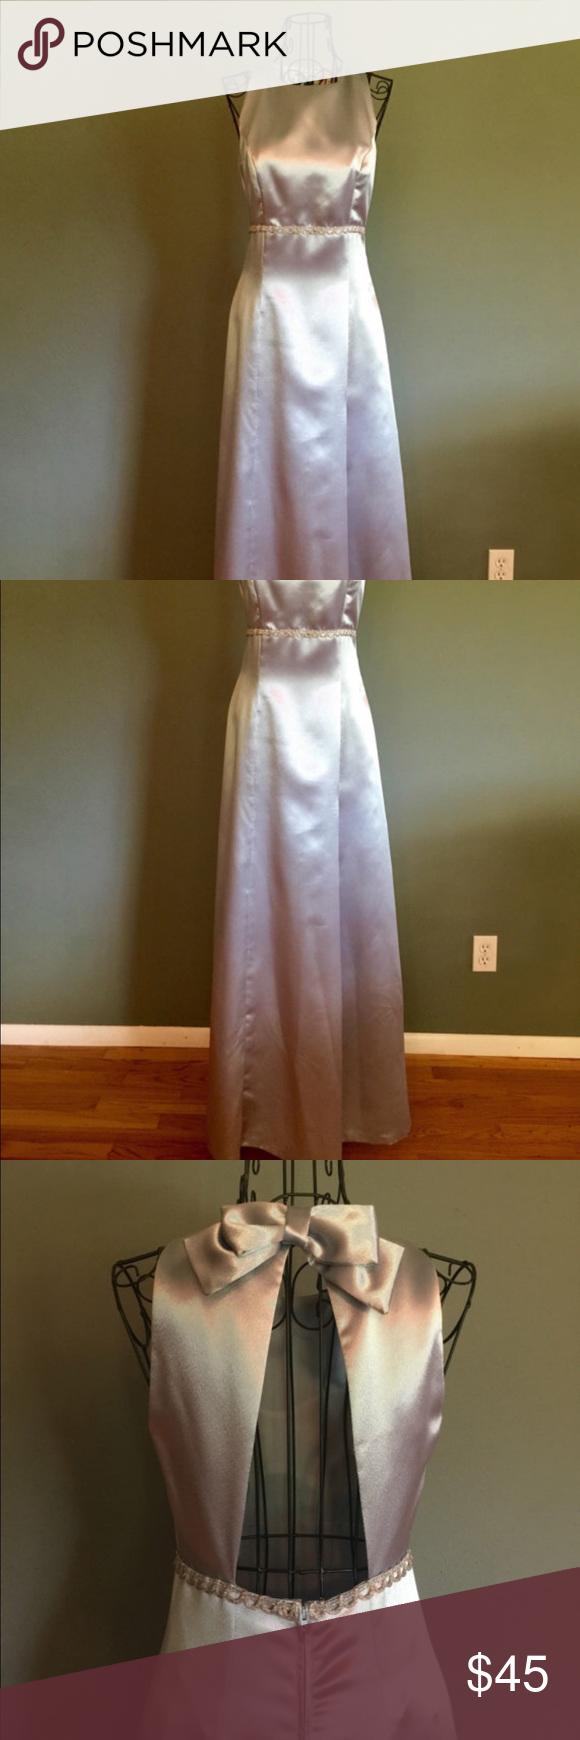 Extra Long Tall Formal Dress Dresses Formal Dresses Custom Dresses [ 1740 x 580 Pixel ]